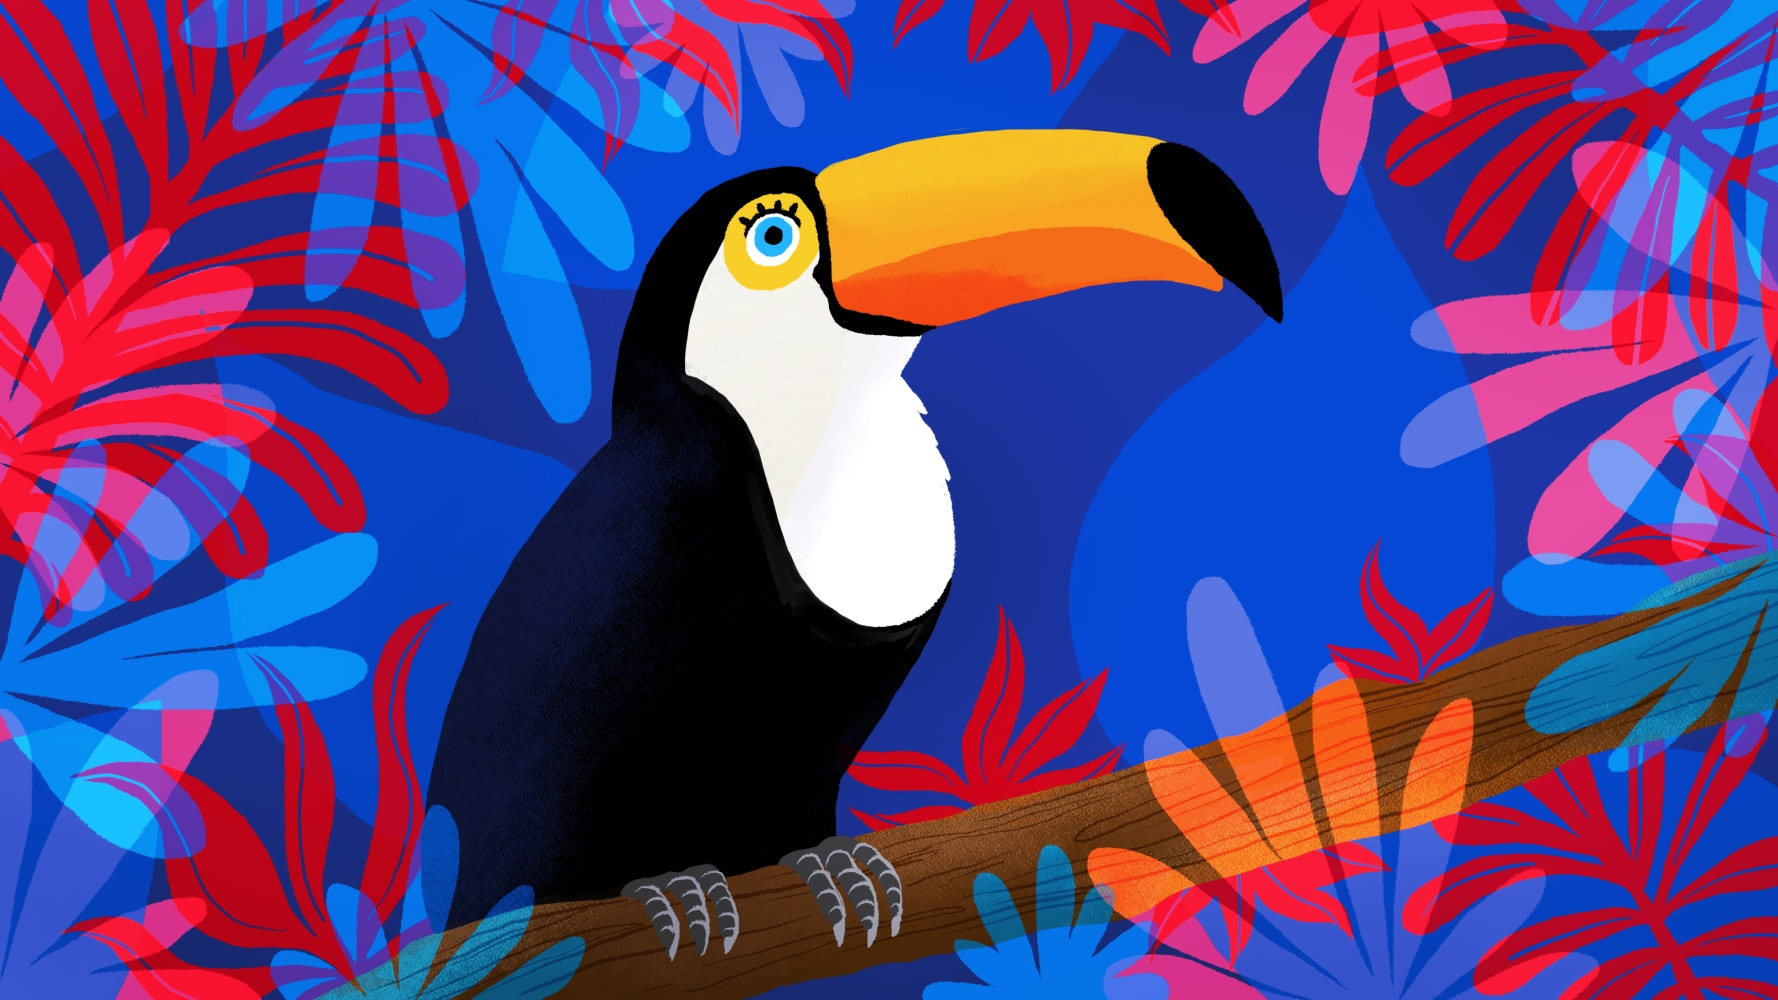 Toucan bird in the jungle